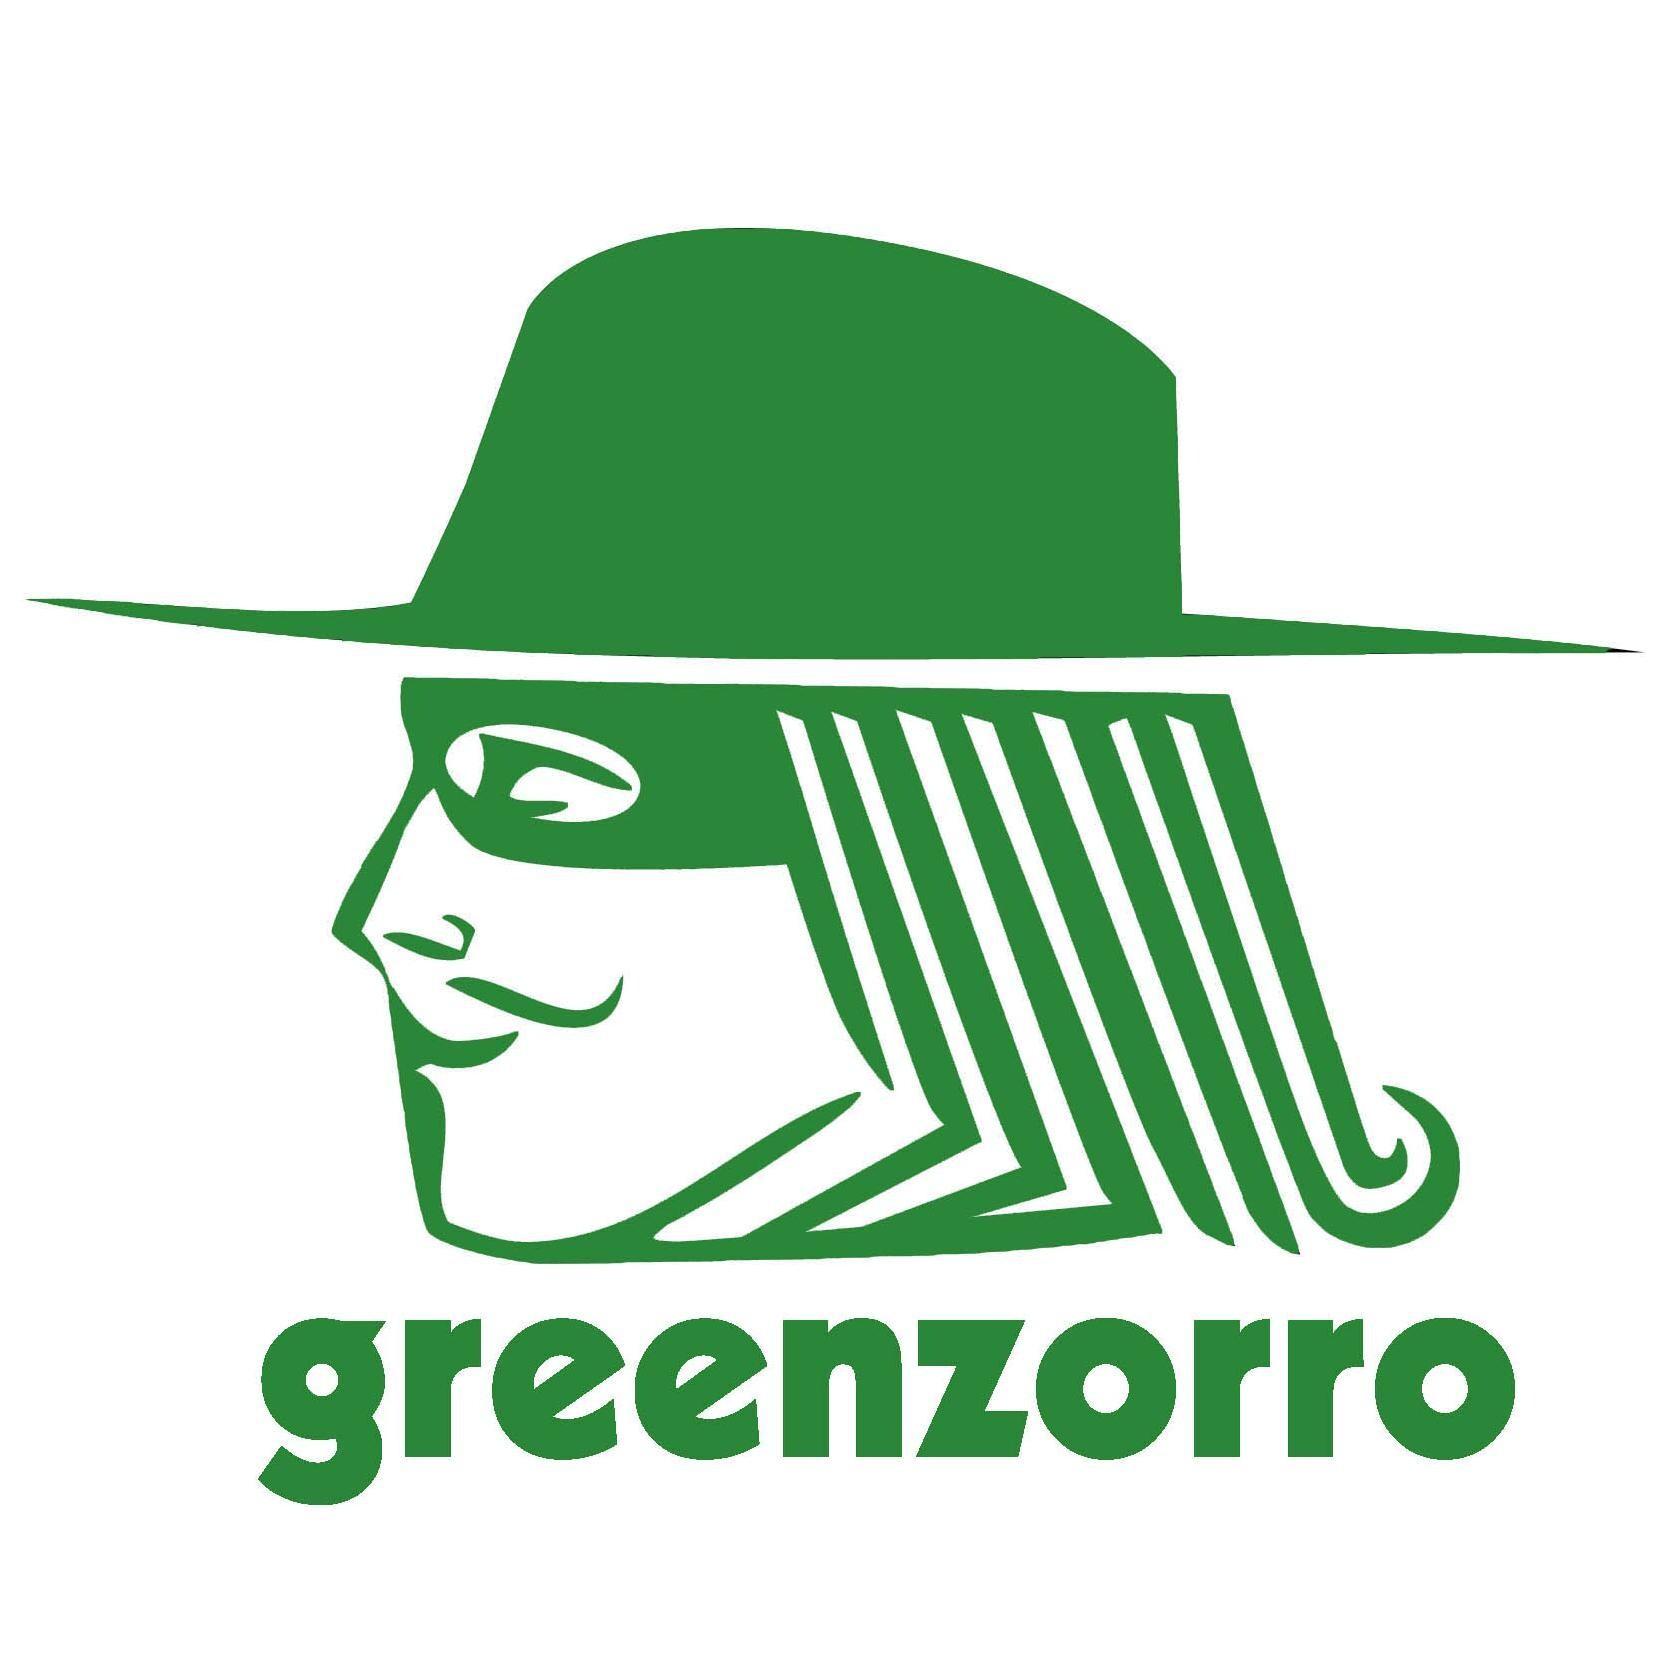 Greenzorro